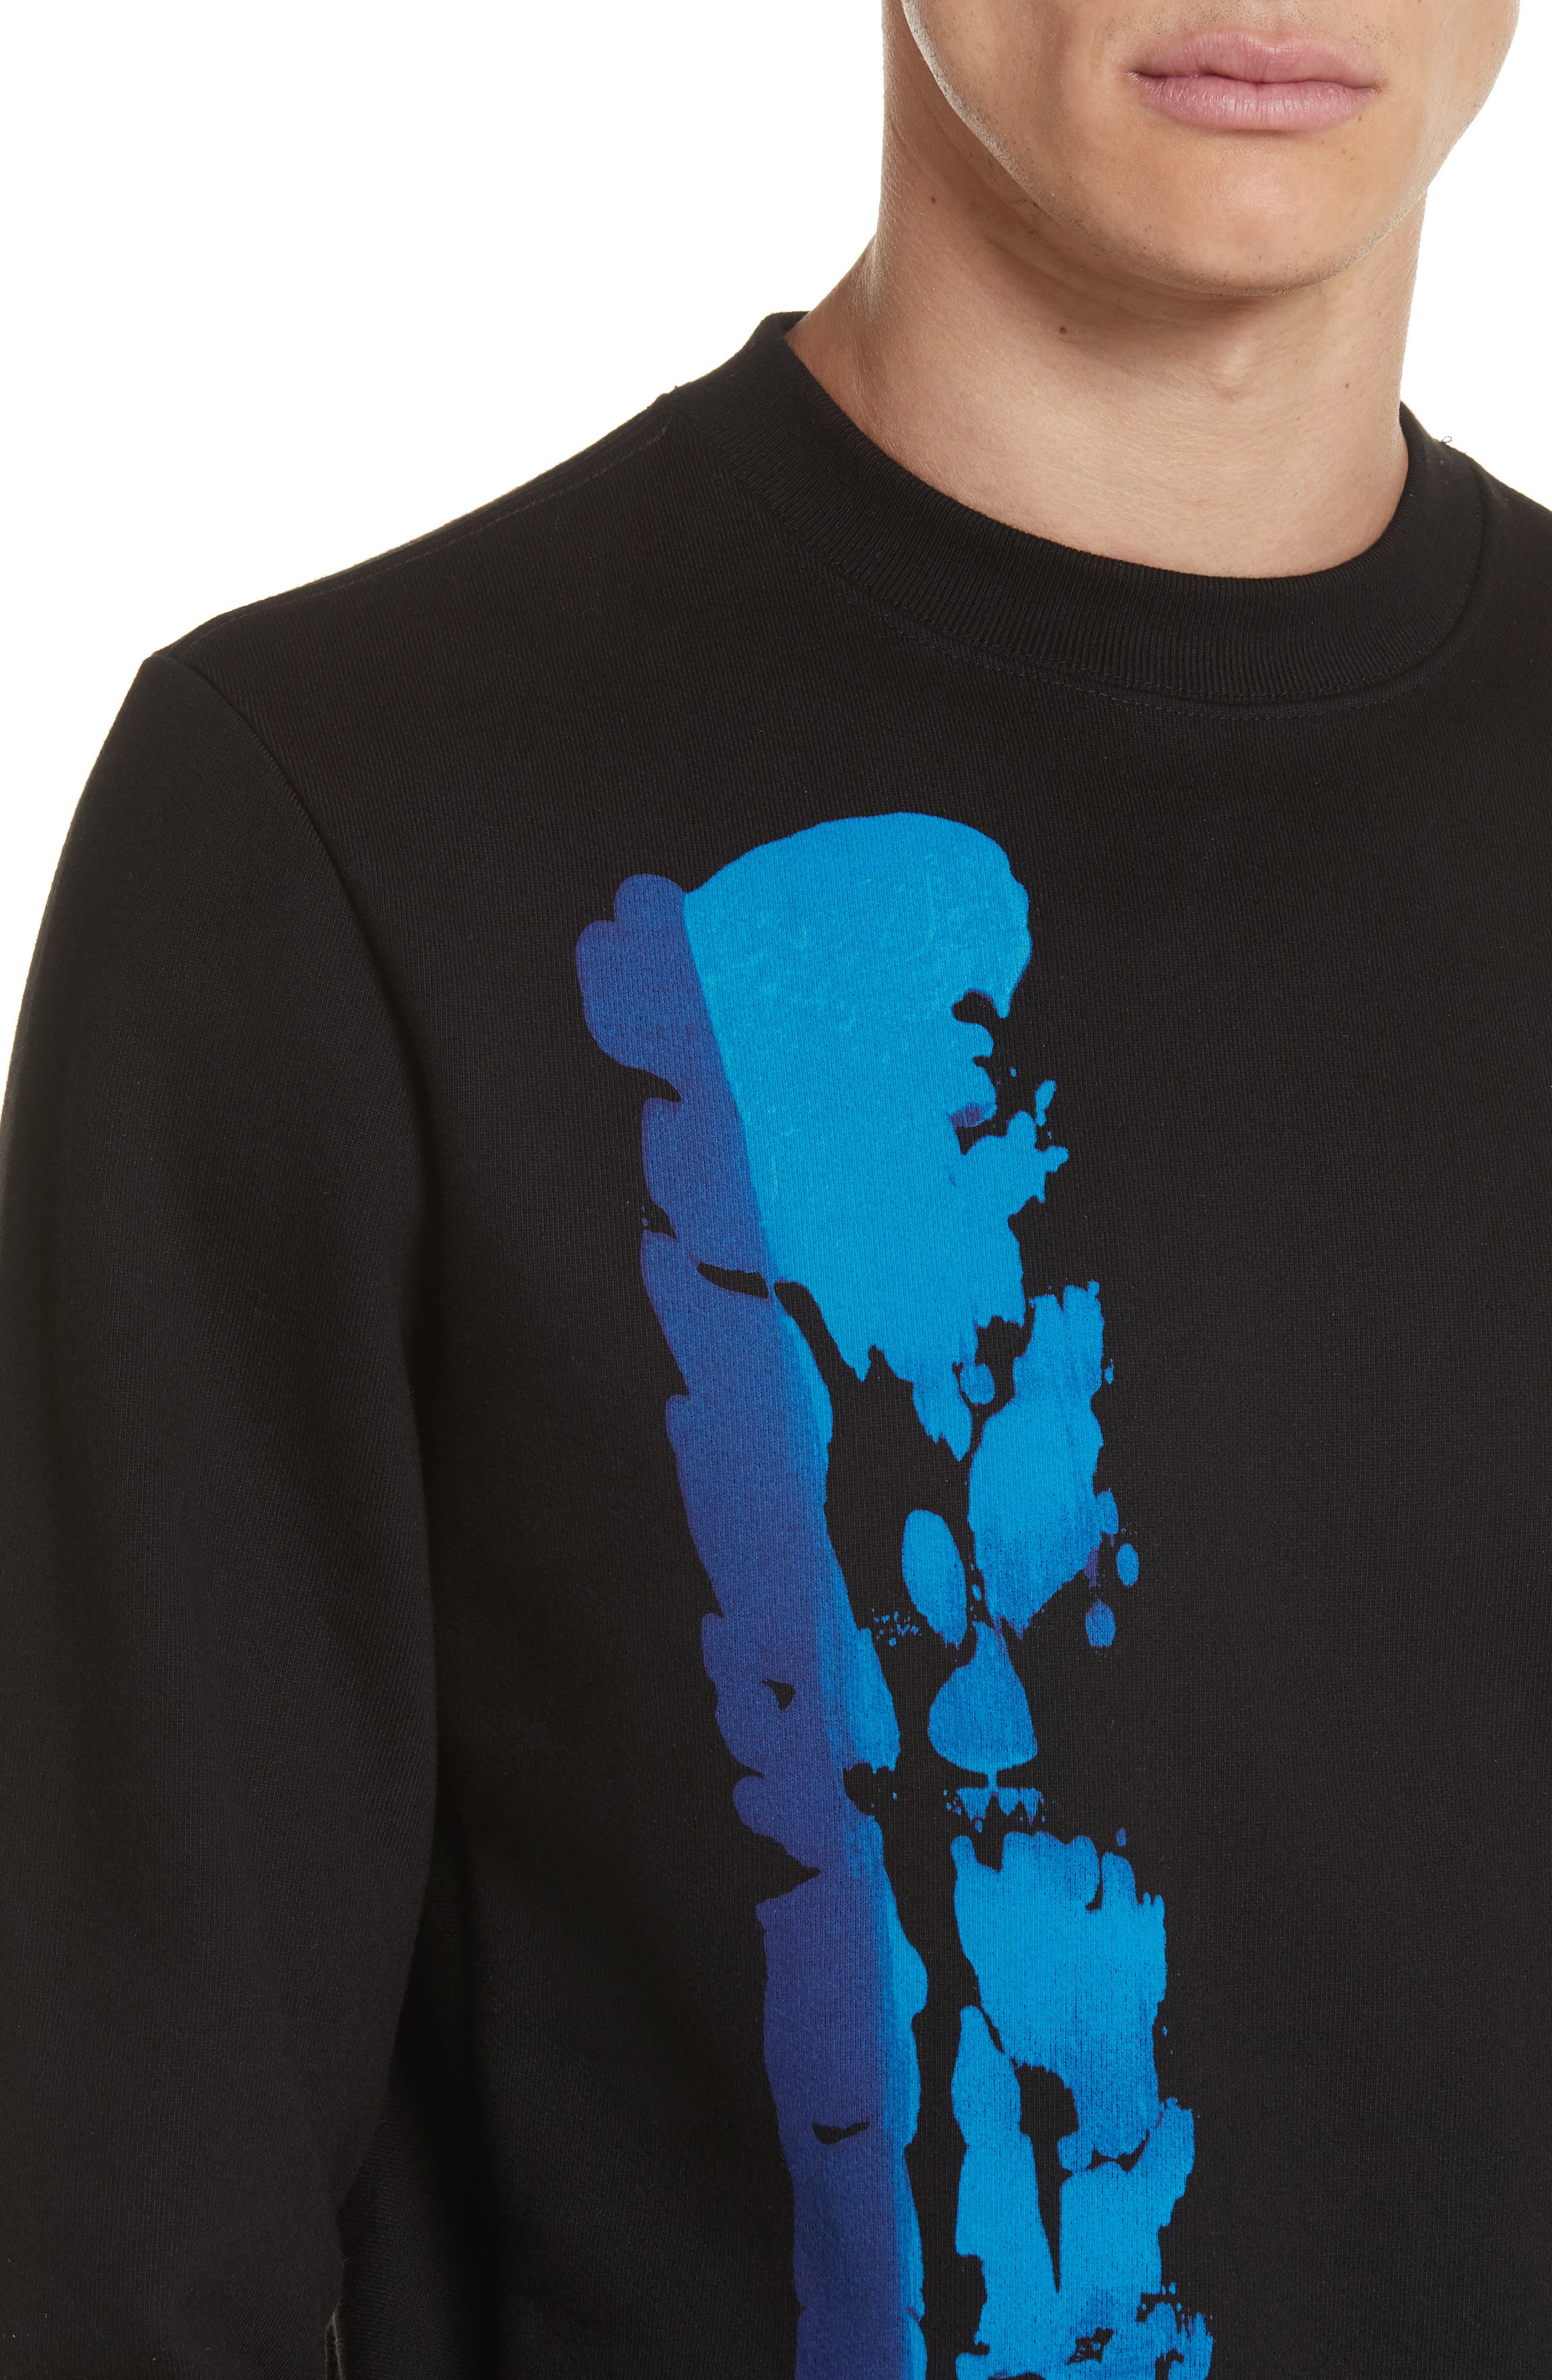 Abstract Brush Graphic Sweatshirt,                             Alternate thumbnail 4, color,                             001